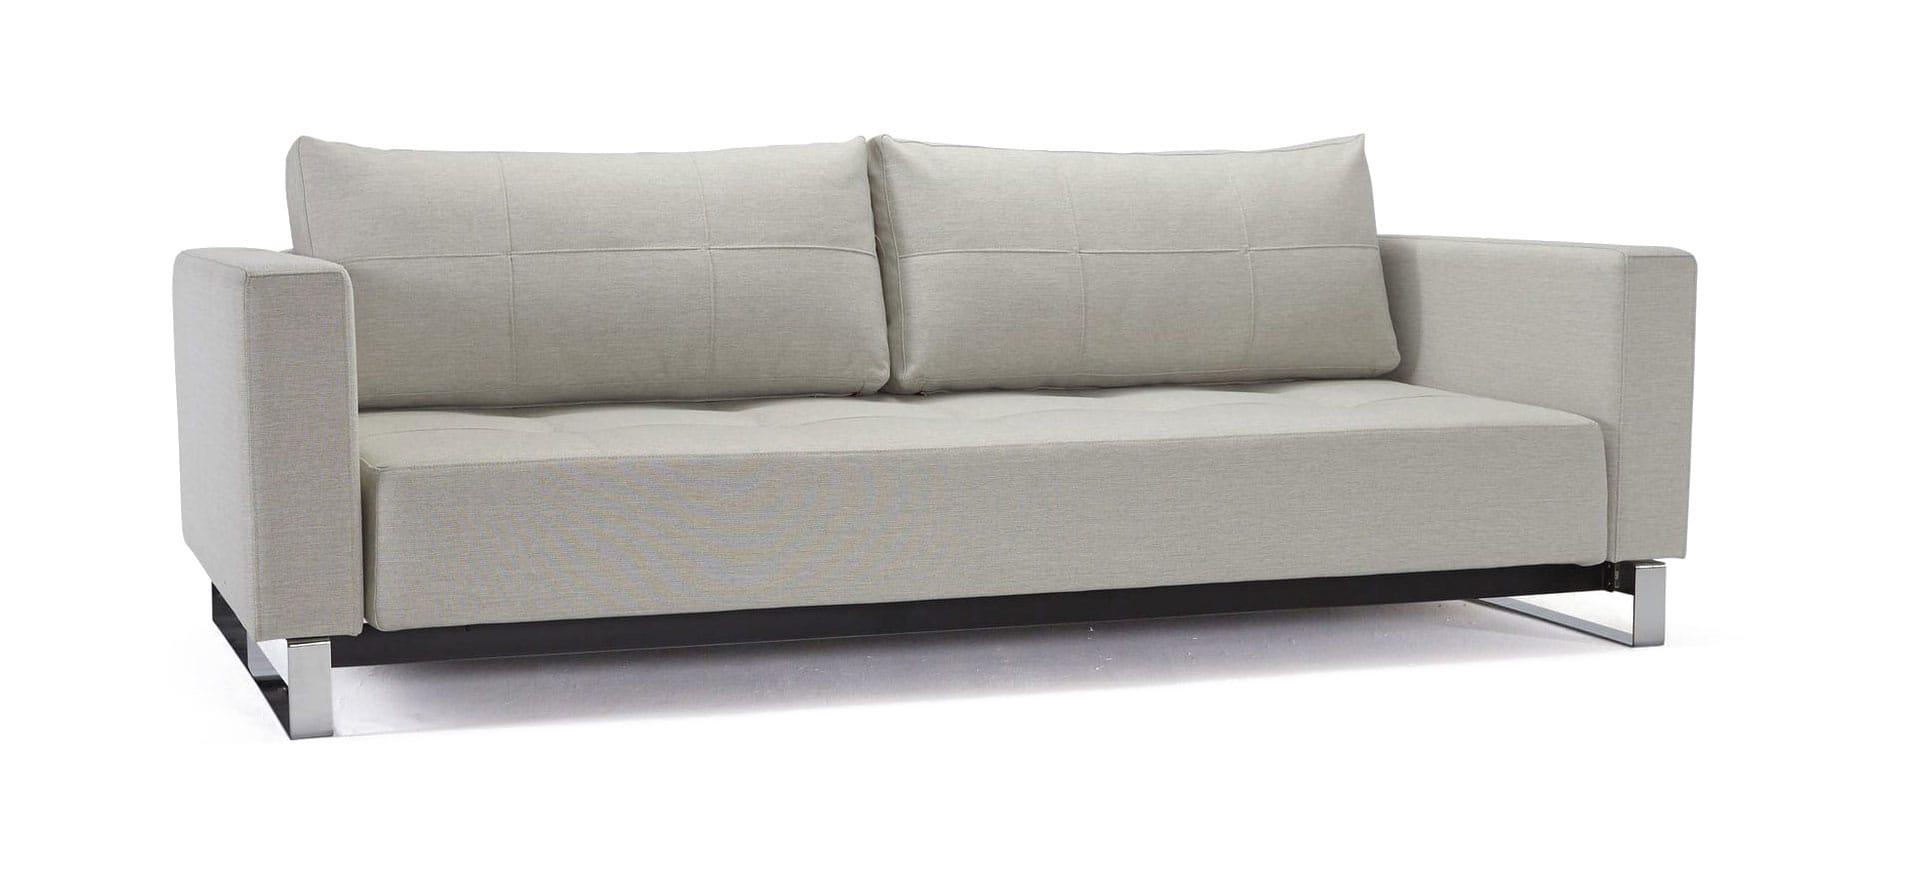 Ultra Cassius Deluxe Excess Sofa Bed (Queen Size) Mixed Dance DM06